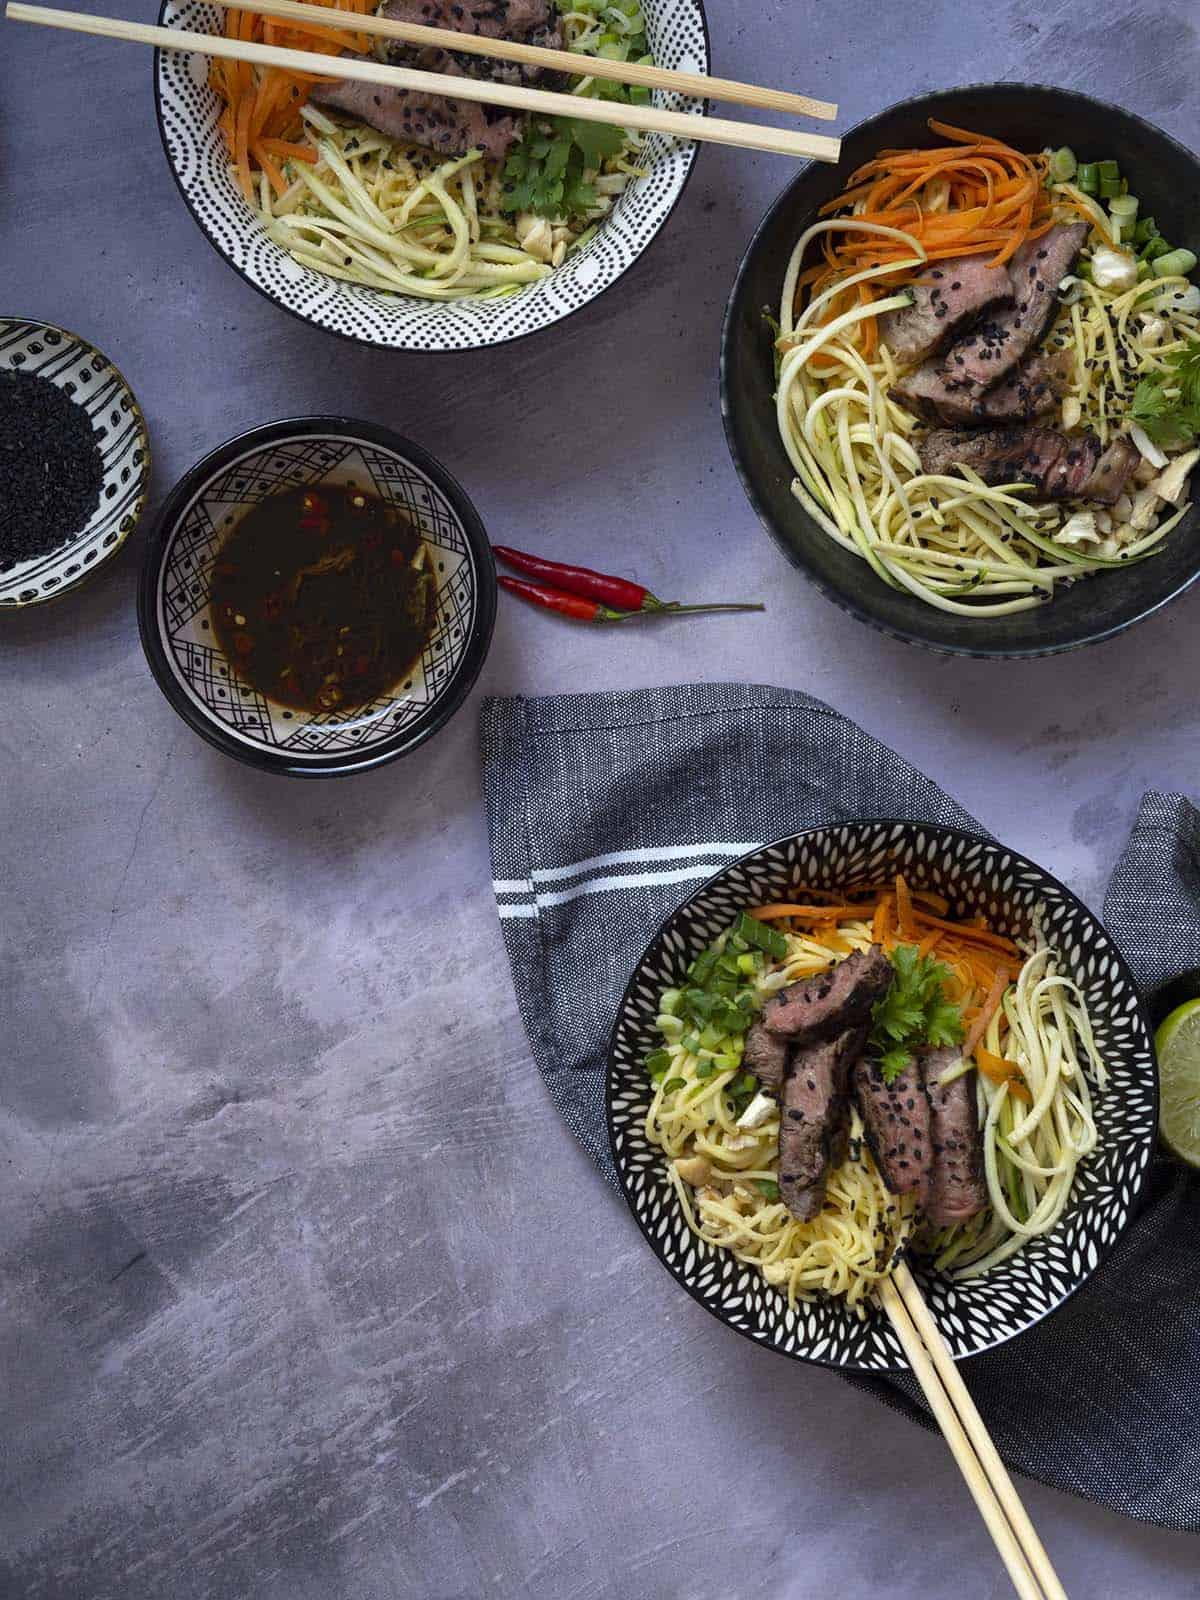 noodles νούντλς με μαριναρισμένο μοσχάρι σόγια, τζίντζερ